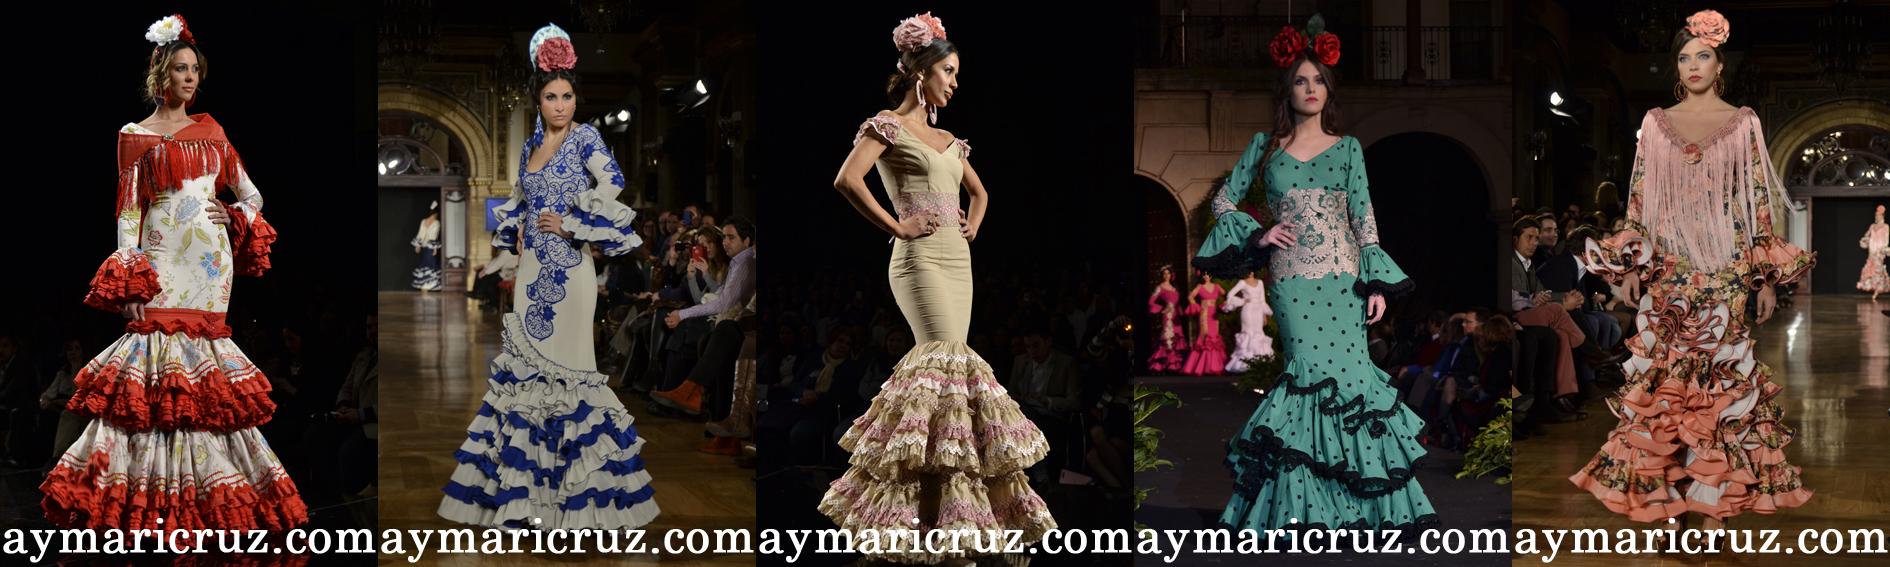 40 trajes para ir a la Feria de Sevilla 2014 (4ª parte)